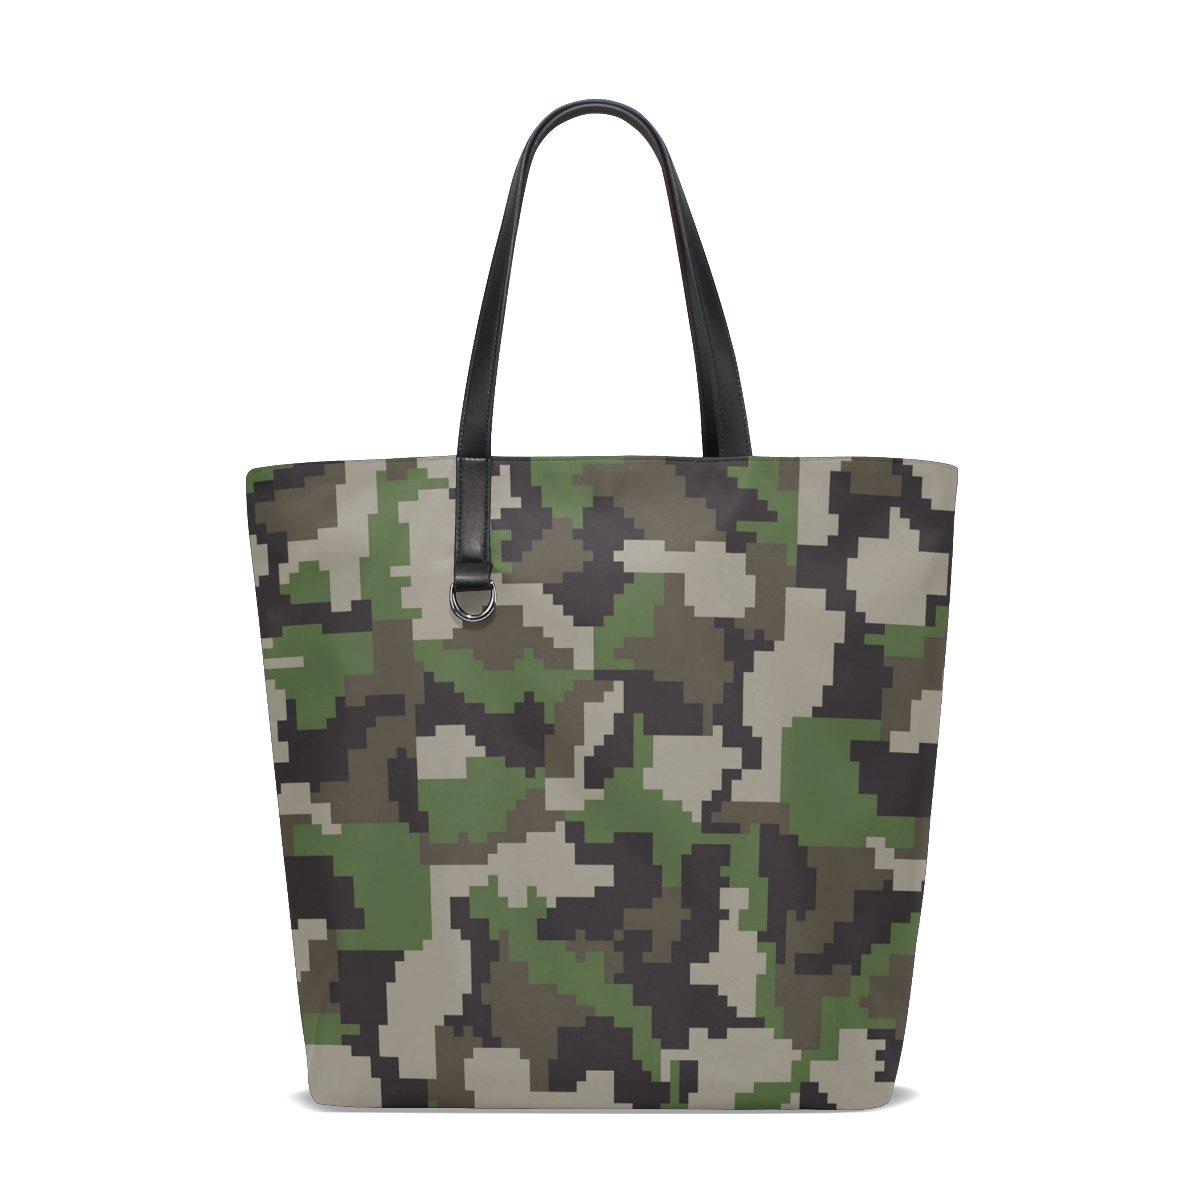 Handbags for Women Mosaic Camouflage Tote Shoulder Bag Satchel for Ladies Girls